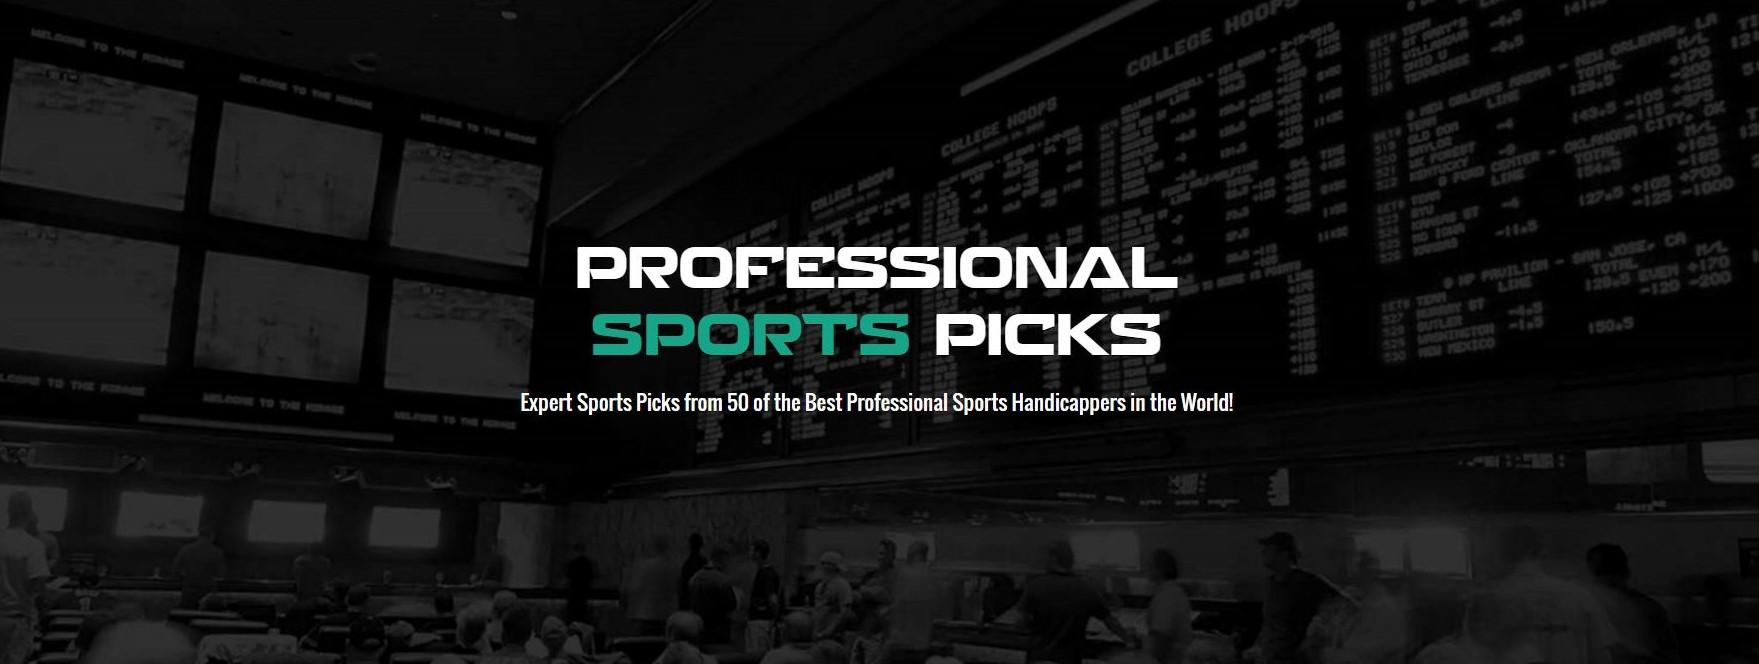 Professional sports betting picks binary options indicator no repaint scalper